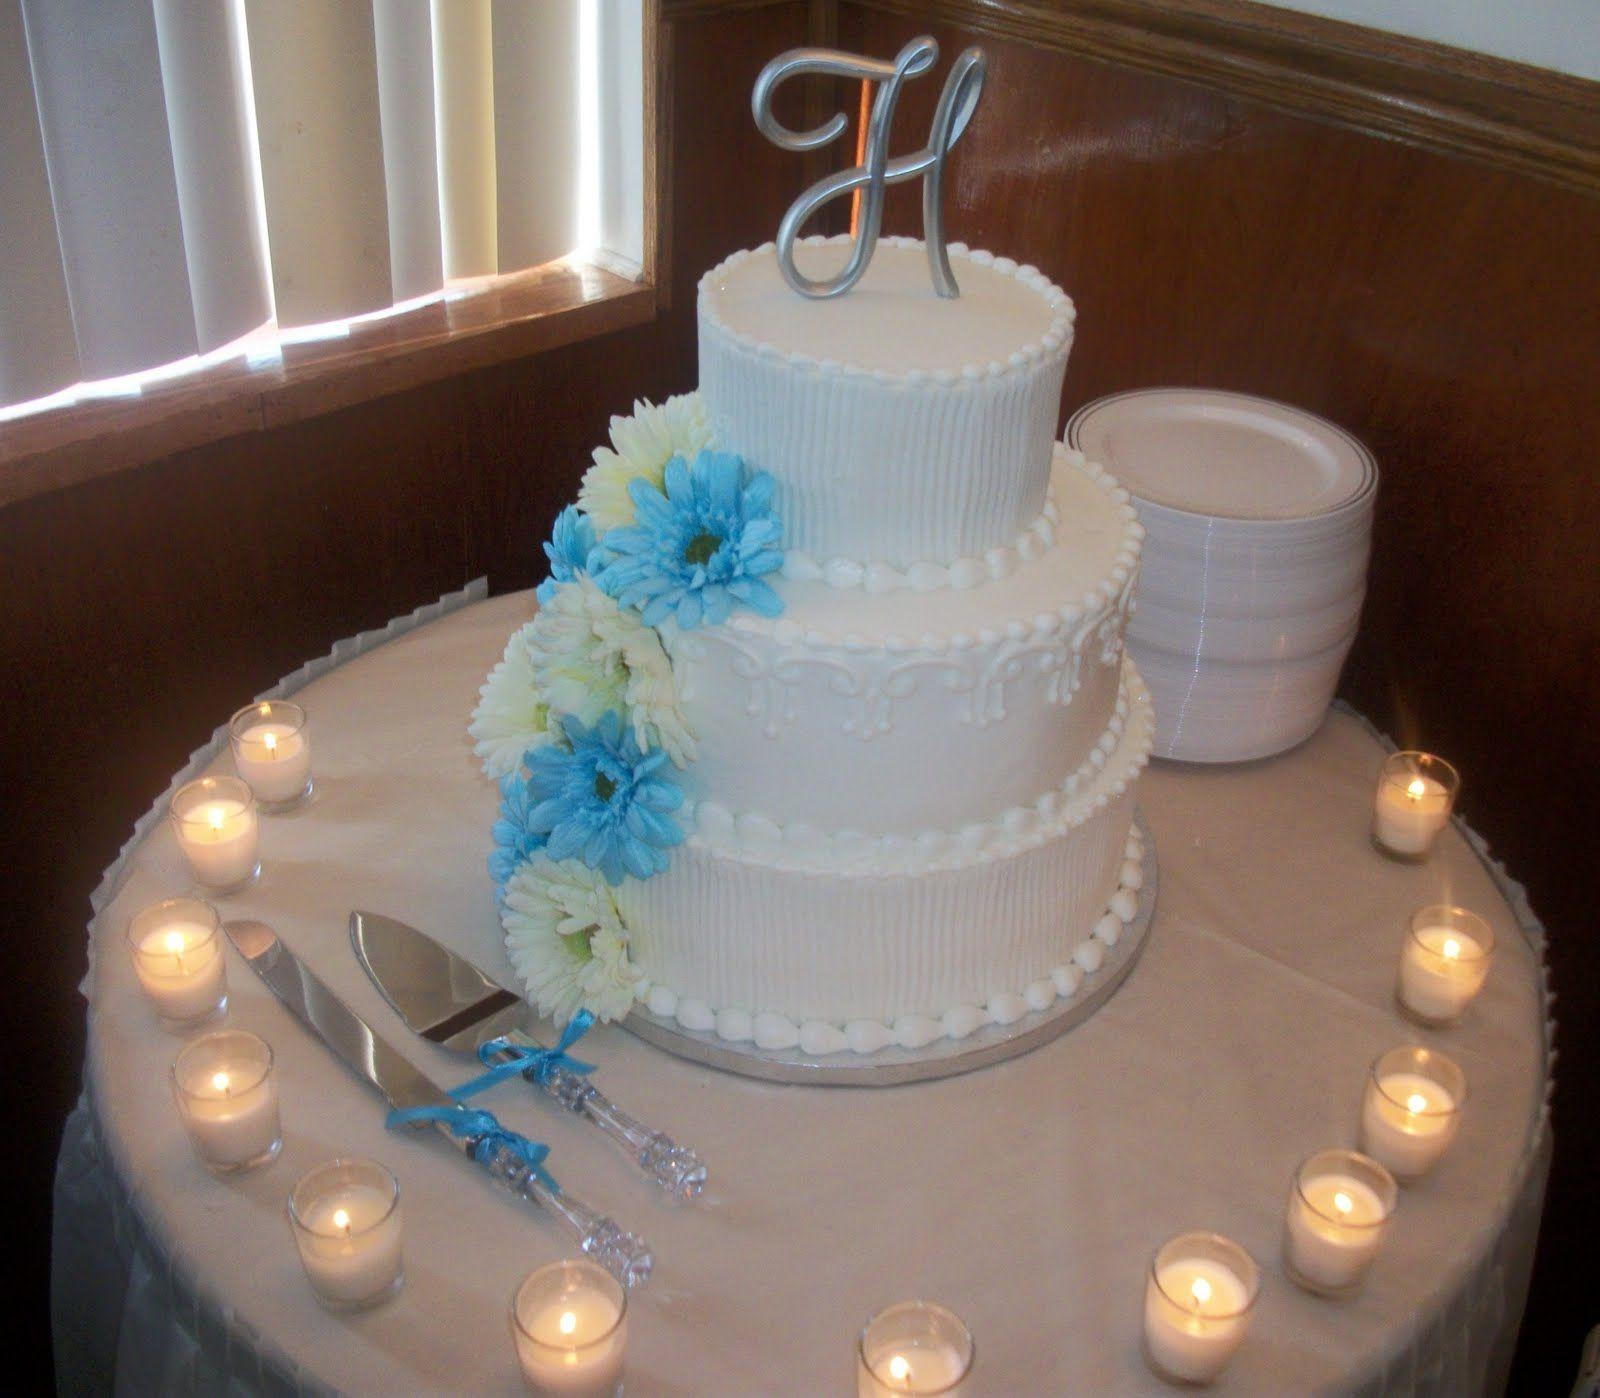 Wedding Cakes From Walmart  Walmart Bakery Wedding Cakes